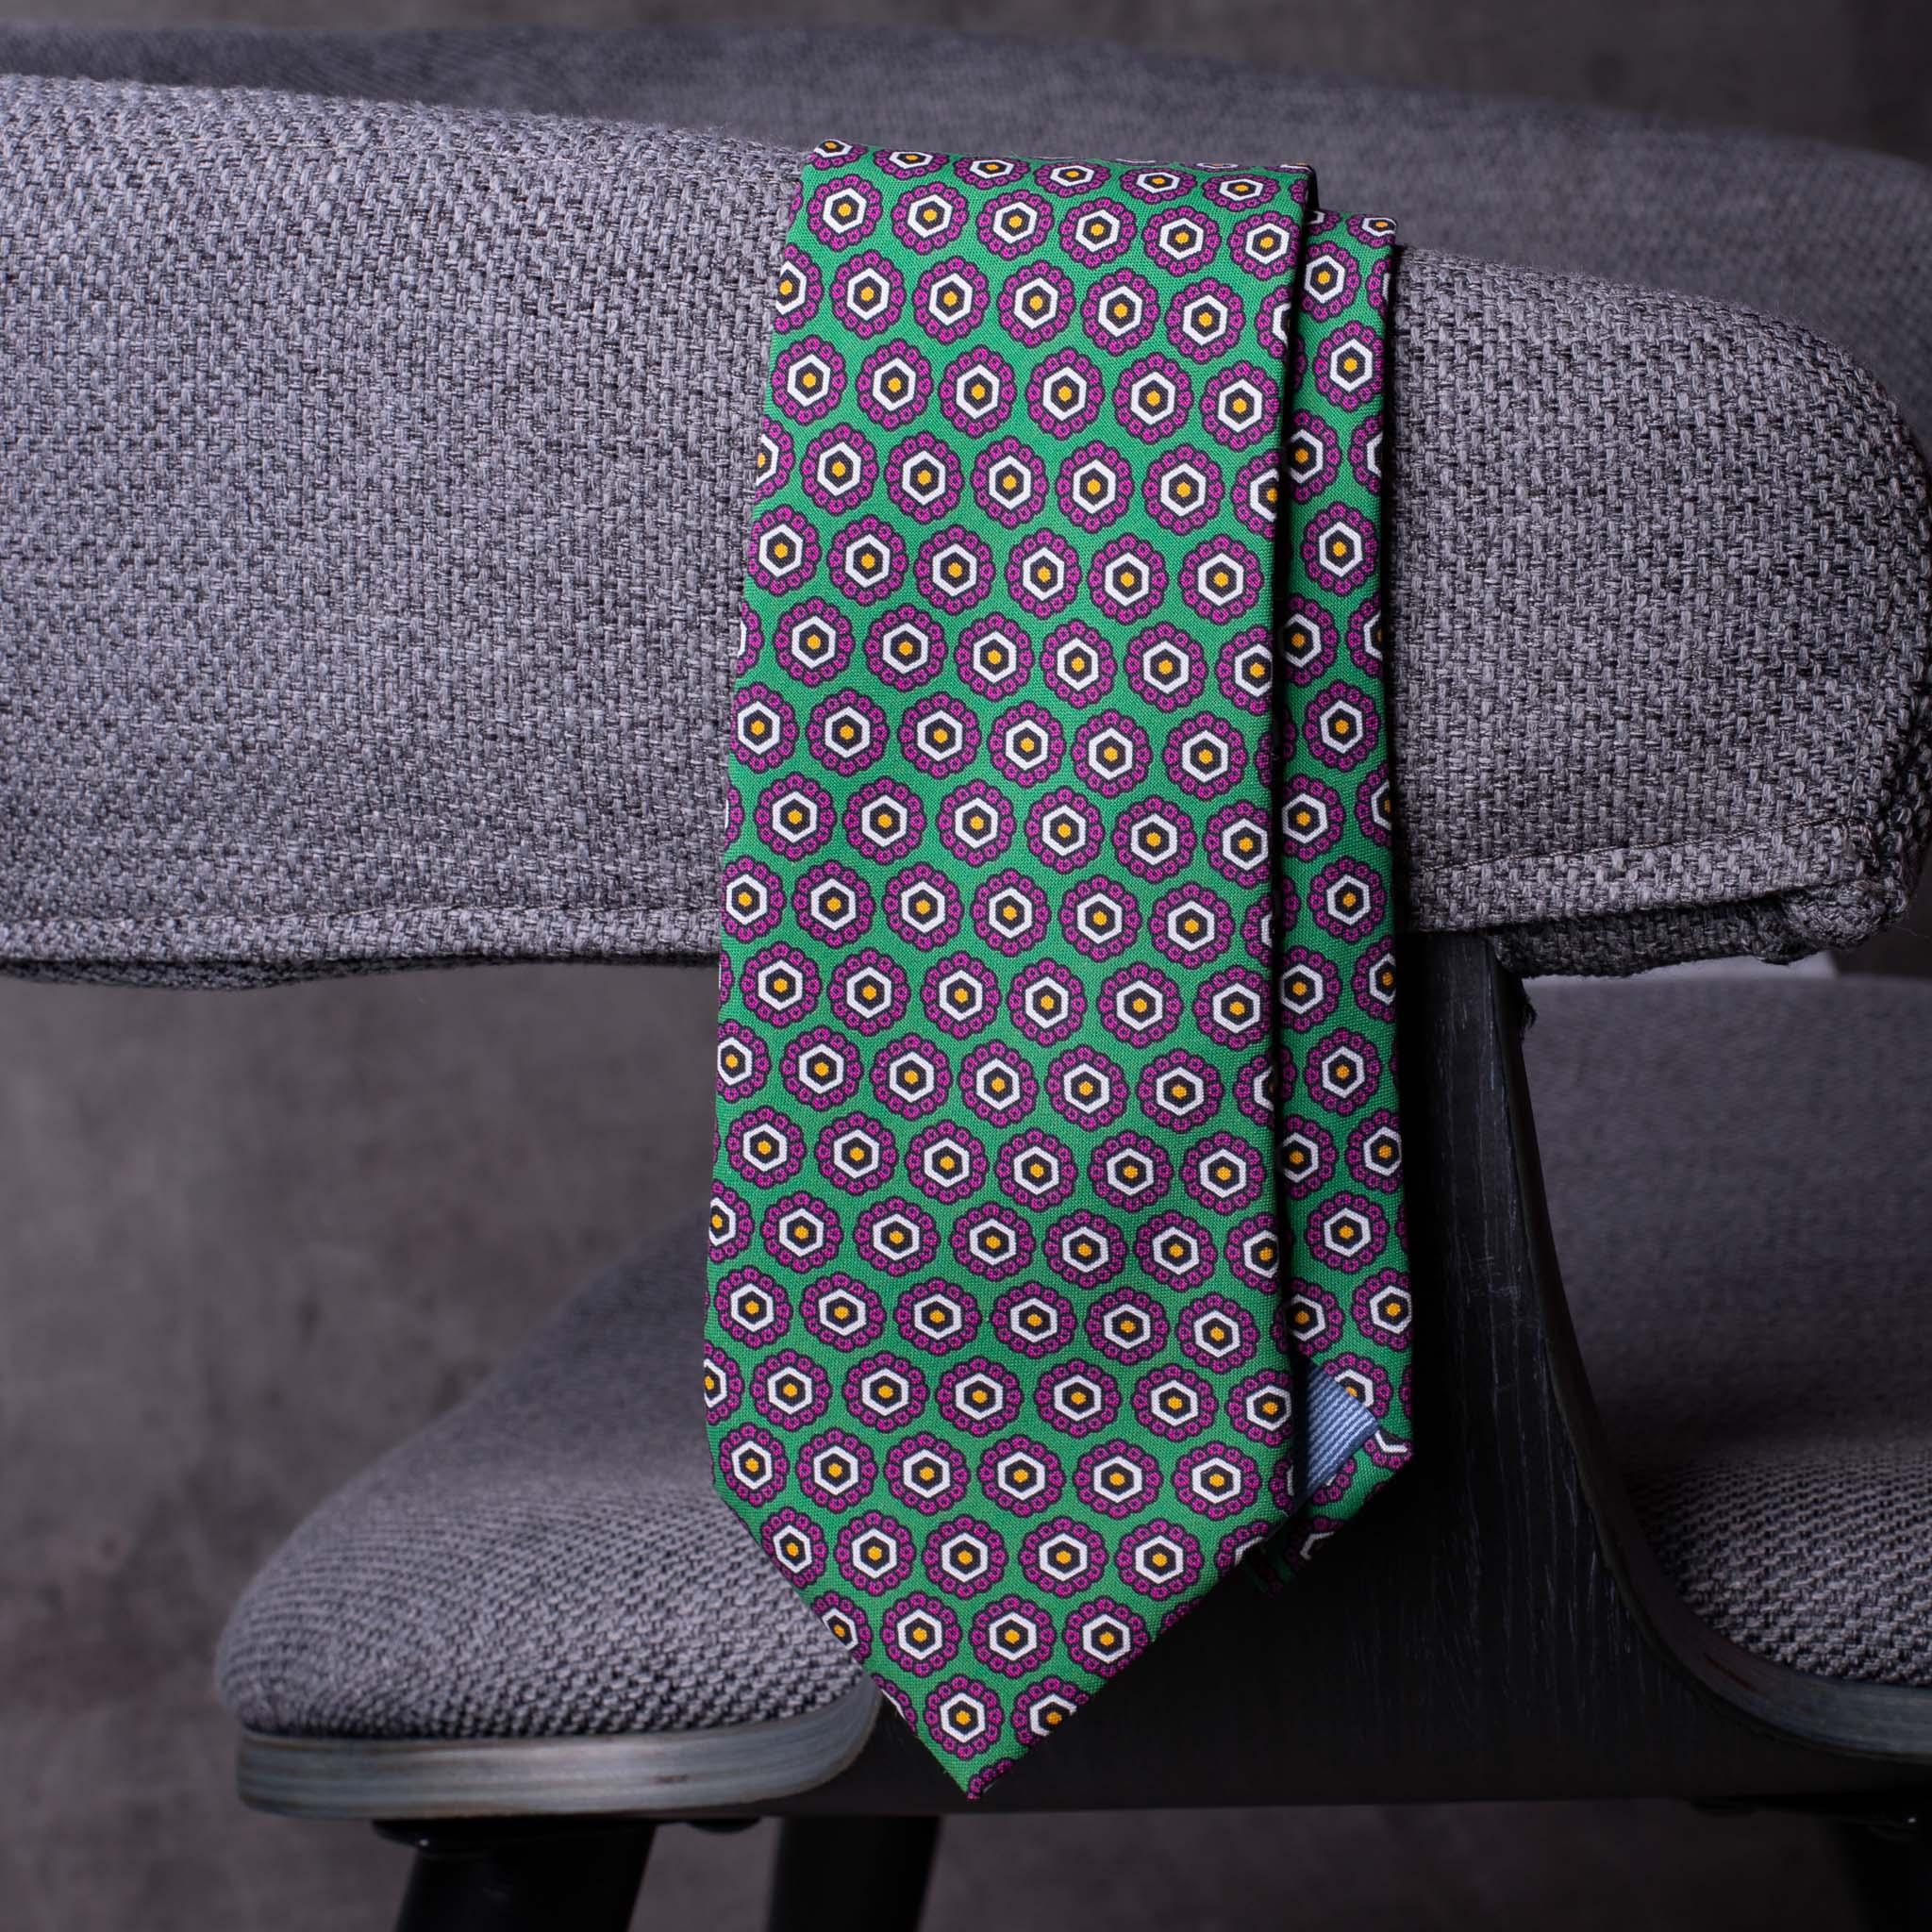 PRINTED SILK-0200-Tie-Initials-Corbata-Iniciales-The-Seelk-3